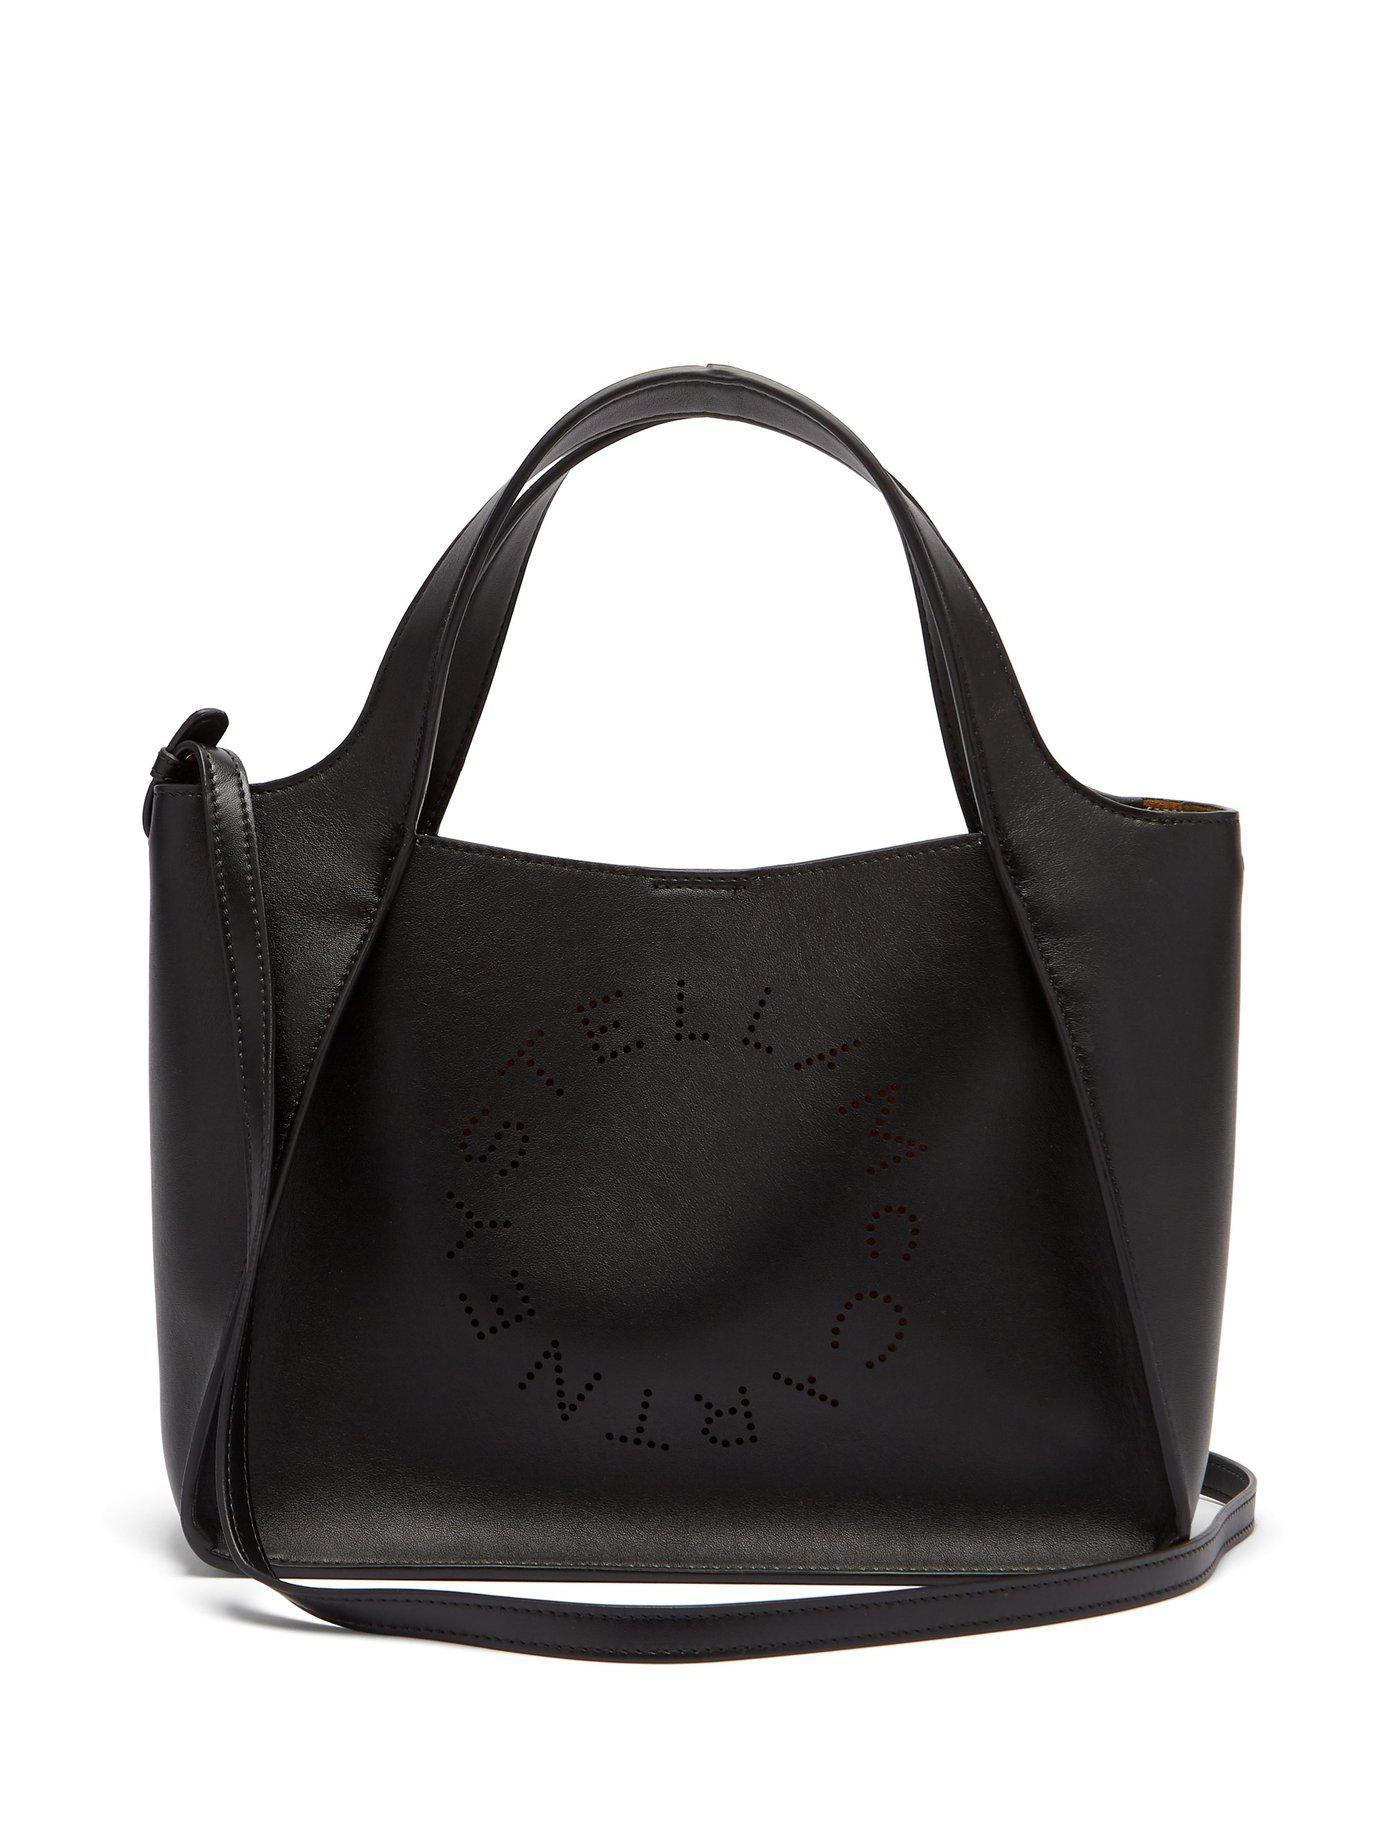 Stella McCartney. Women s Black Stella Perforated Logo Faux Leather Tote Bag ec34f2247a7d1